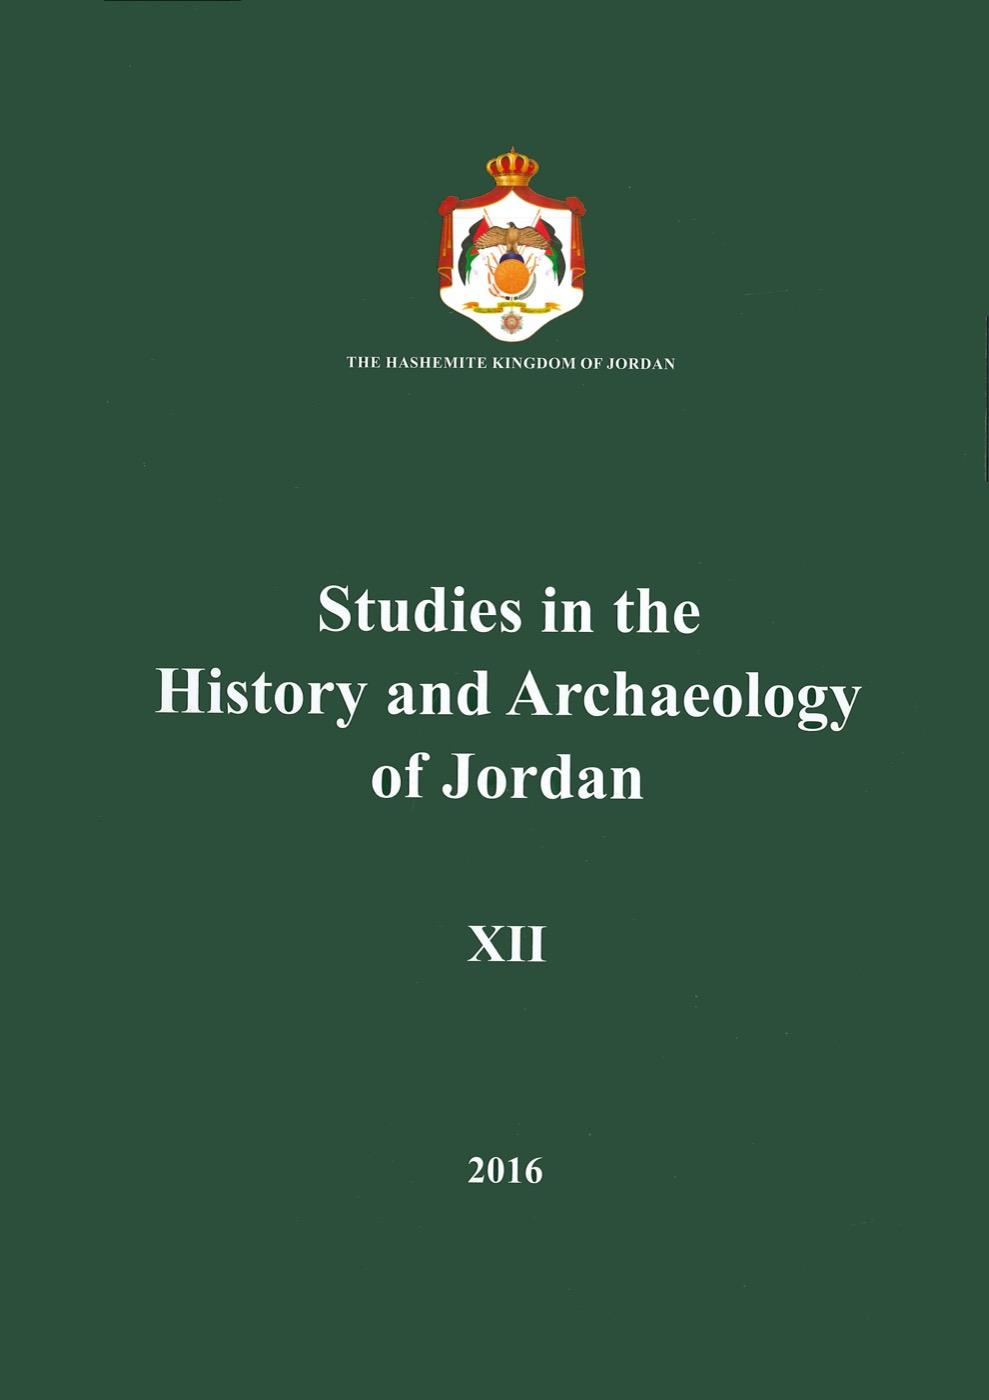 II. The origin of Transjordanian and Syrian polities